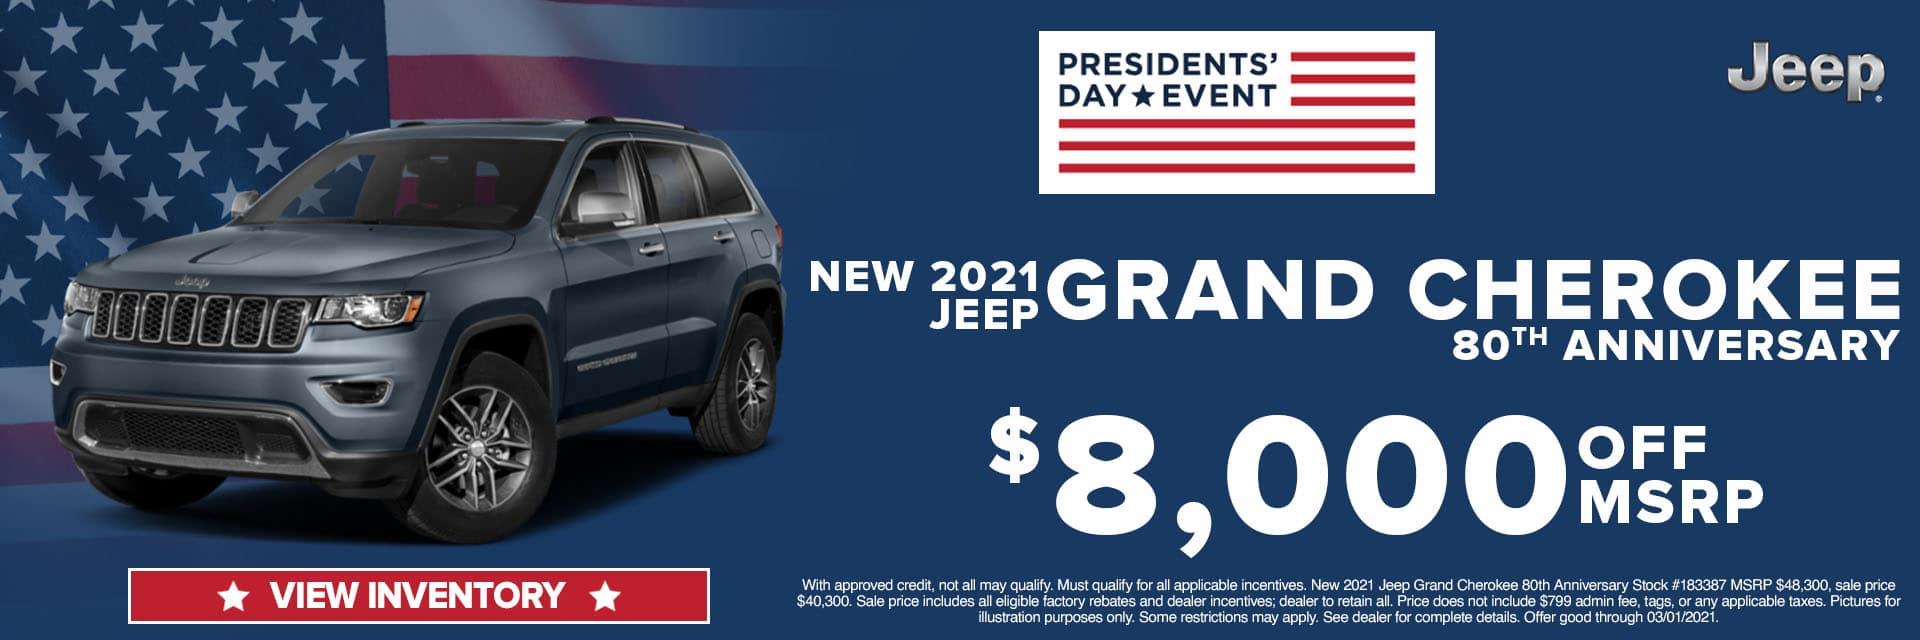 CLCP-February 2021-2021 Jeep Grand Cherokee